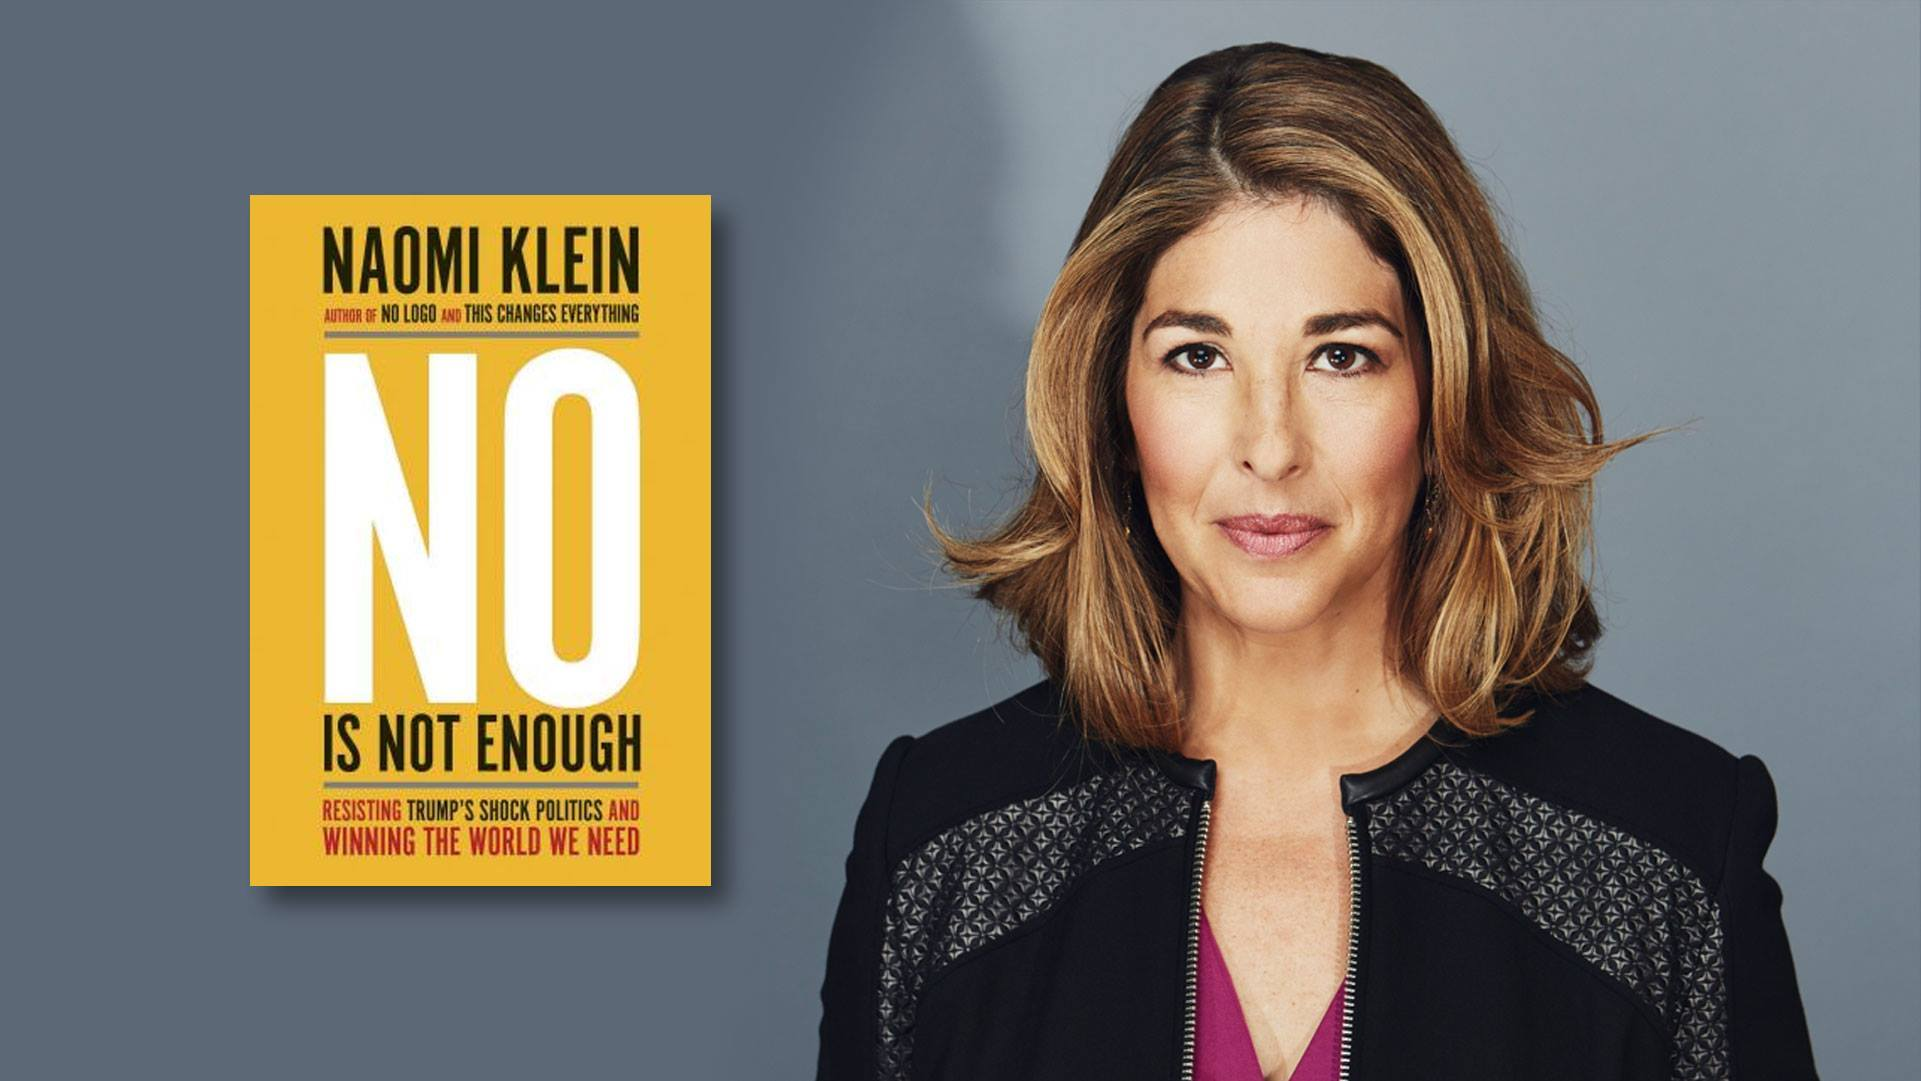 Resisting Trump's Shock Doctrine: An Evening with Naomi Klein @ Neptune Theater   Seattle   Washington   United States